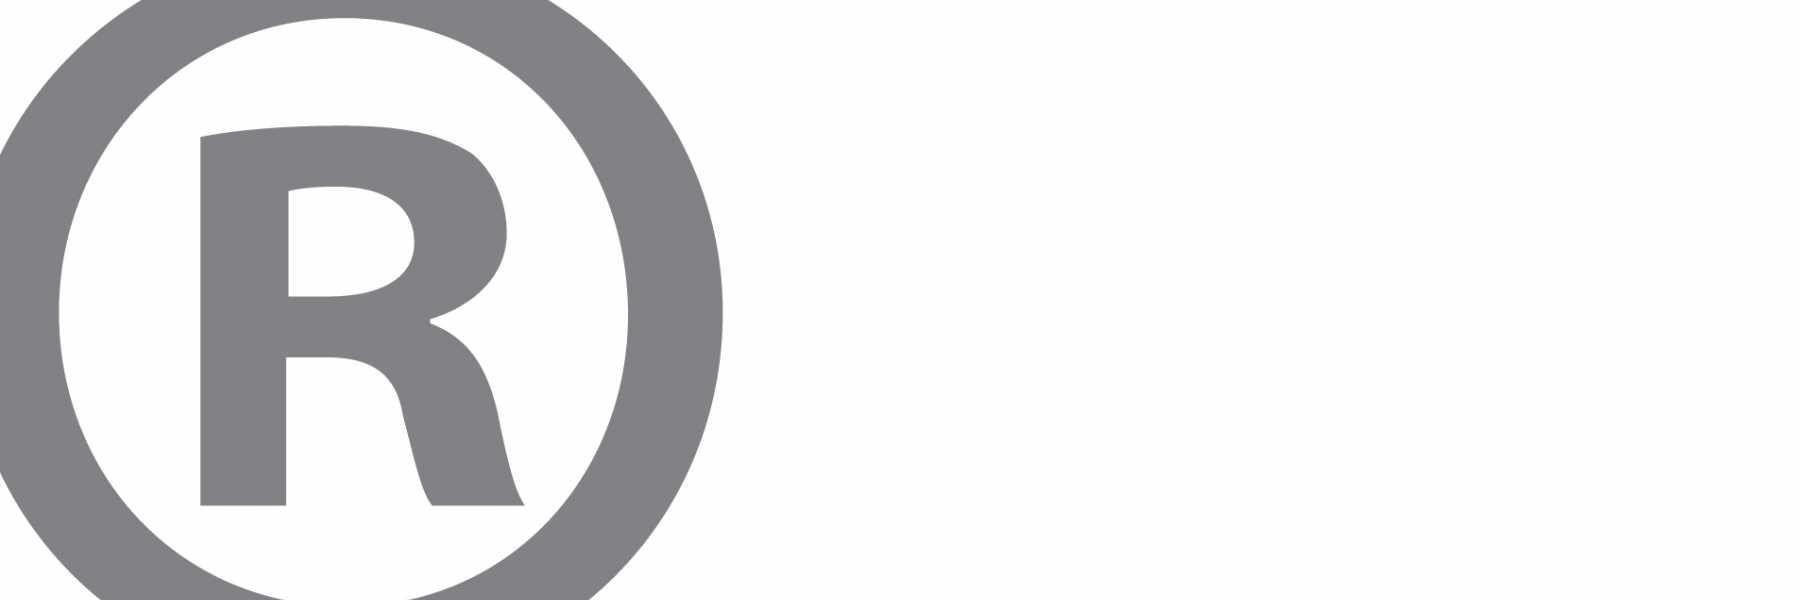 Header Graphic for EvenVision's Blog Post - Should I trademark my logo?